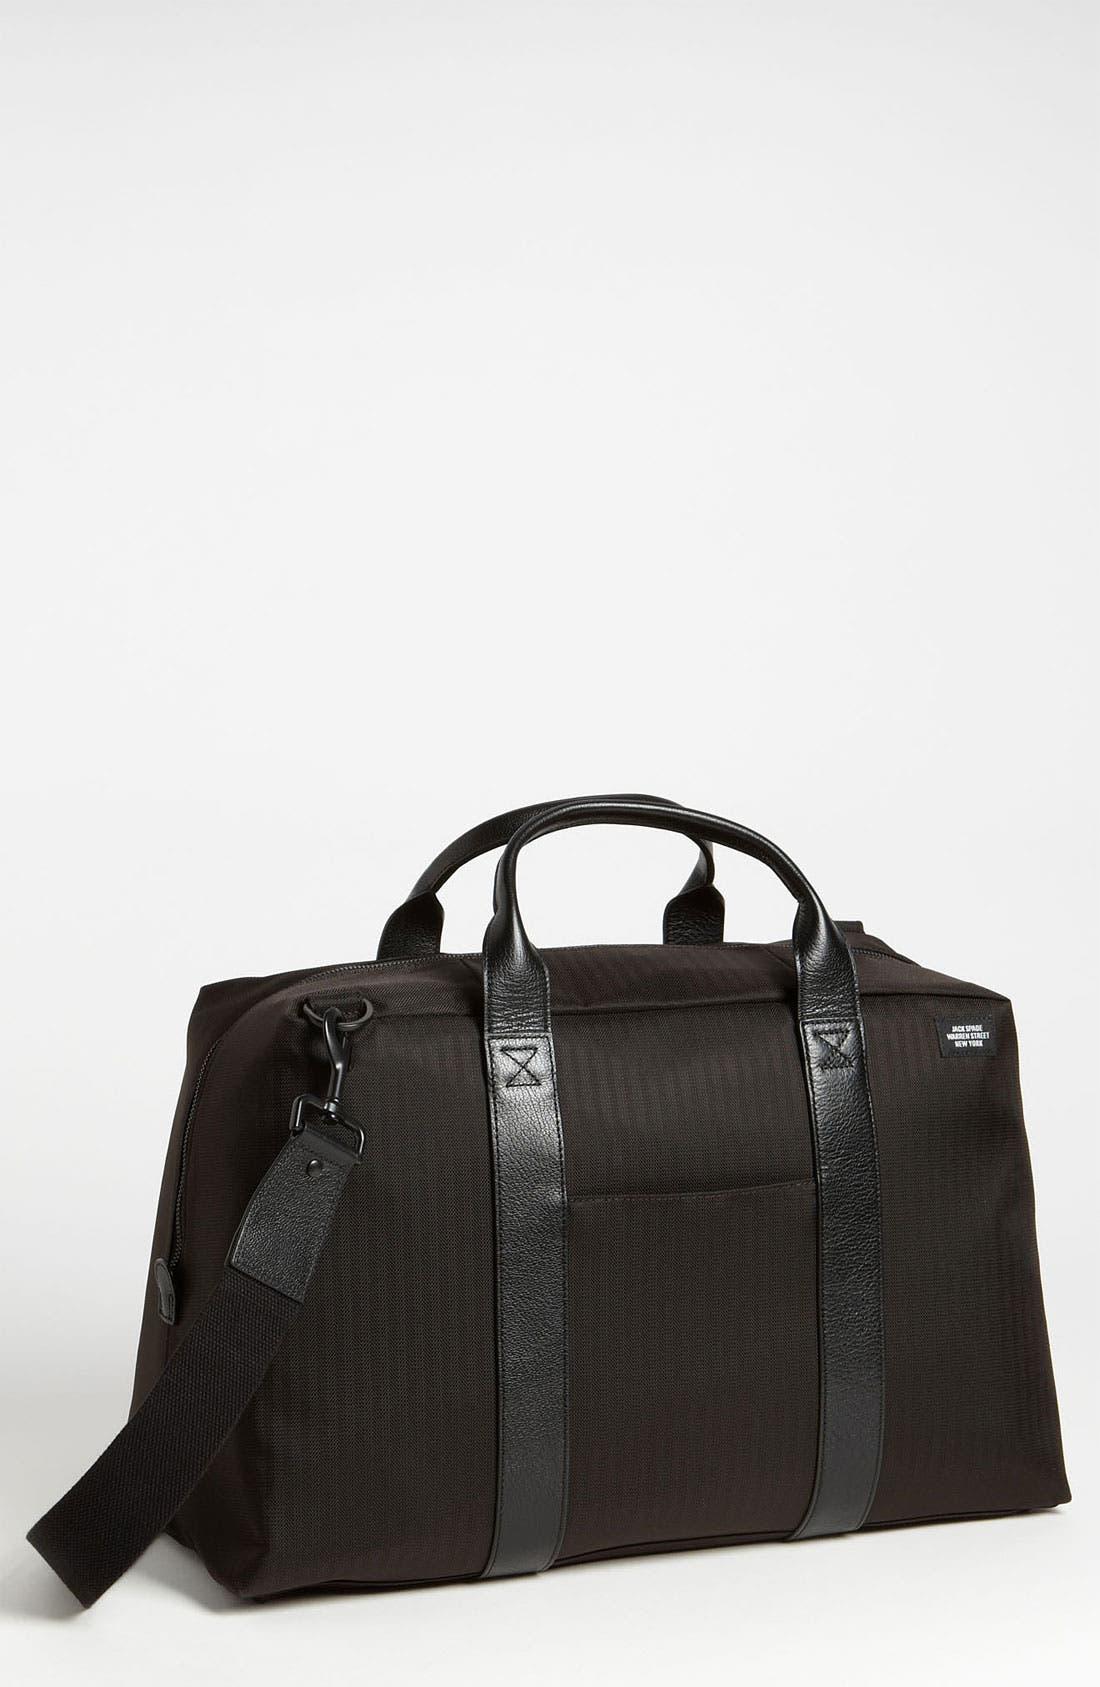 Main Image - Jack Spade 'Wayne' Nylon Duffel Bag